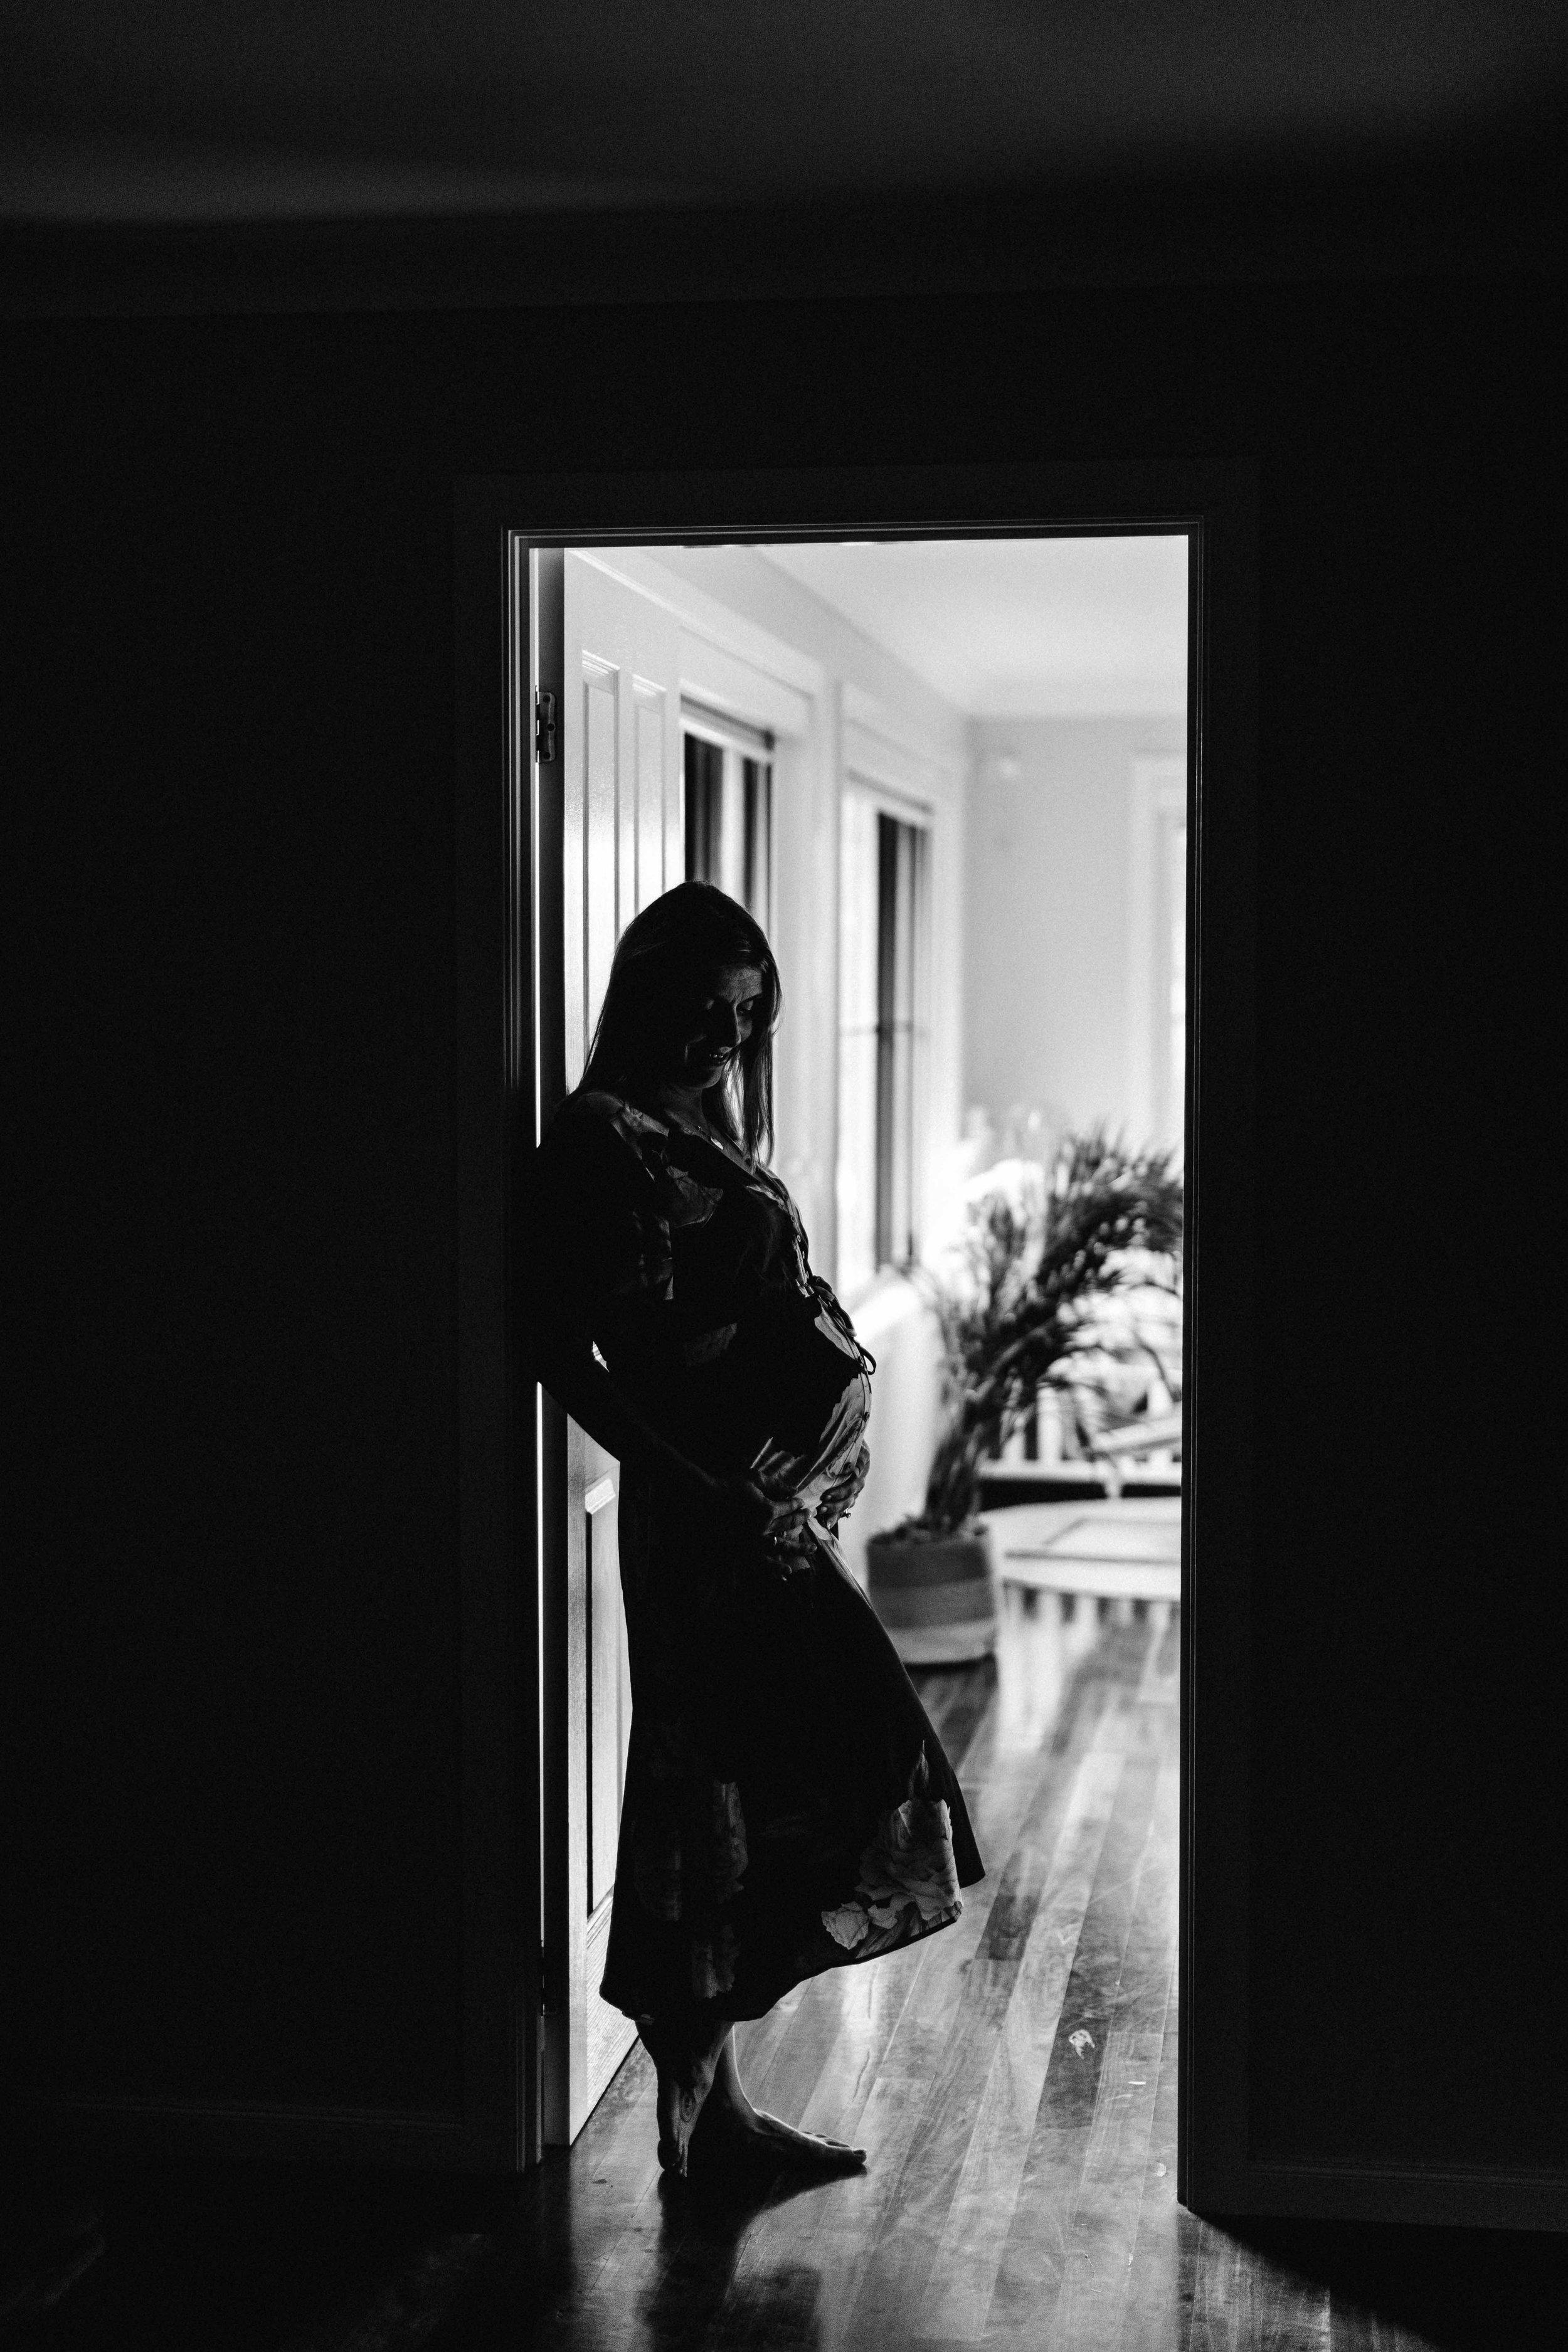 camden-maternity-photography-www.emilyobrienphotography.net-cassandra-50.jpg